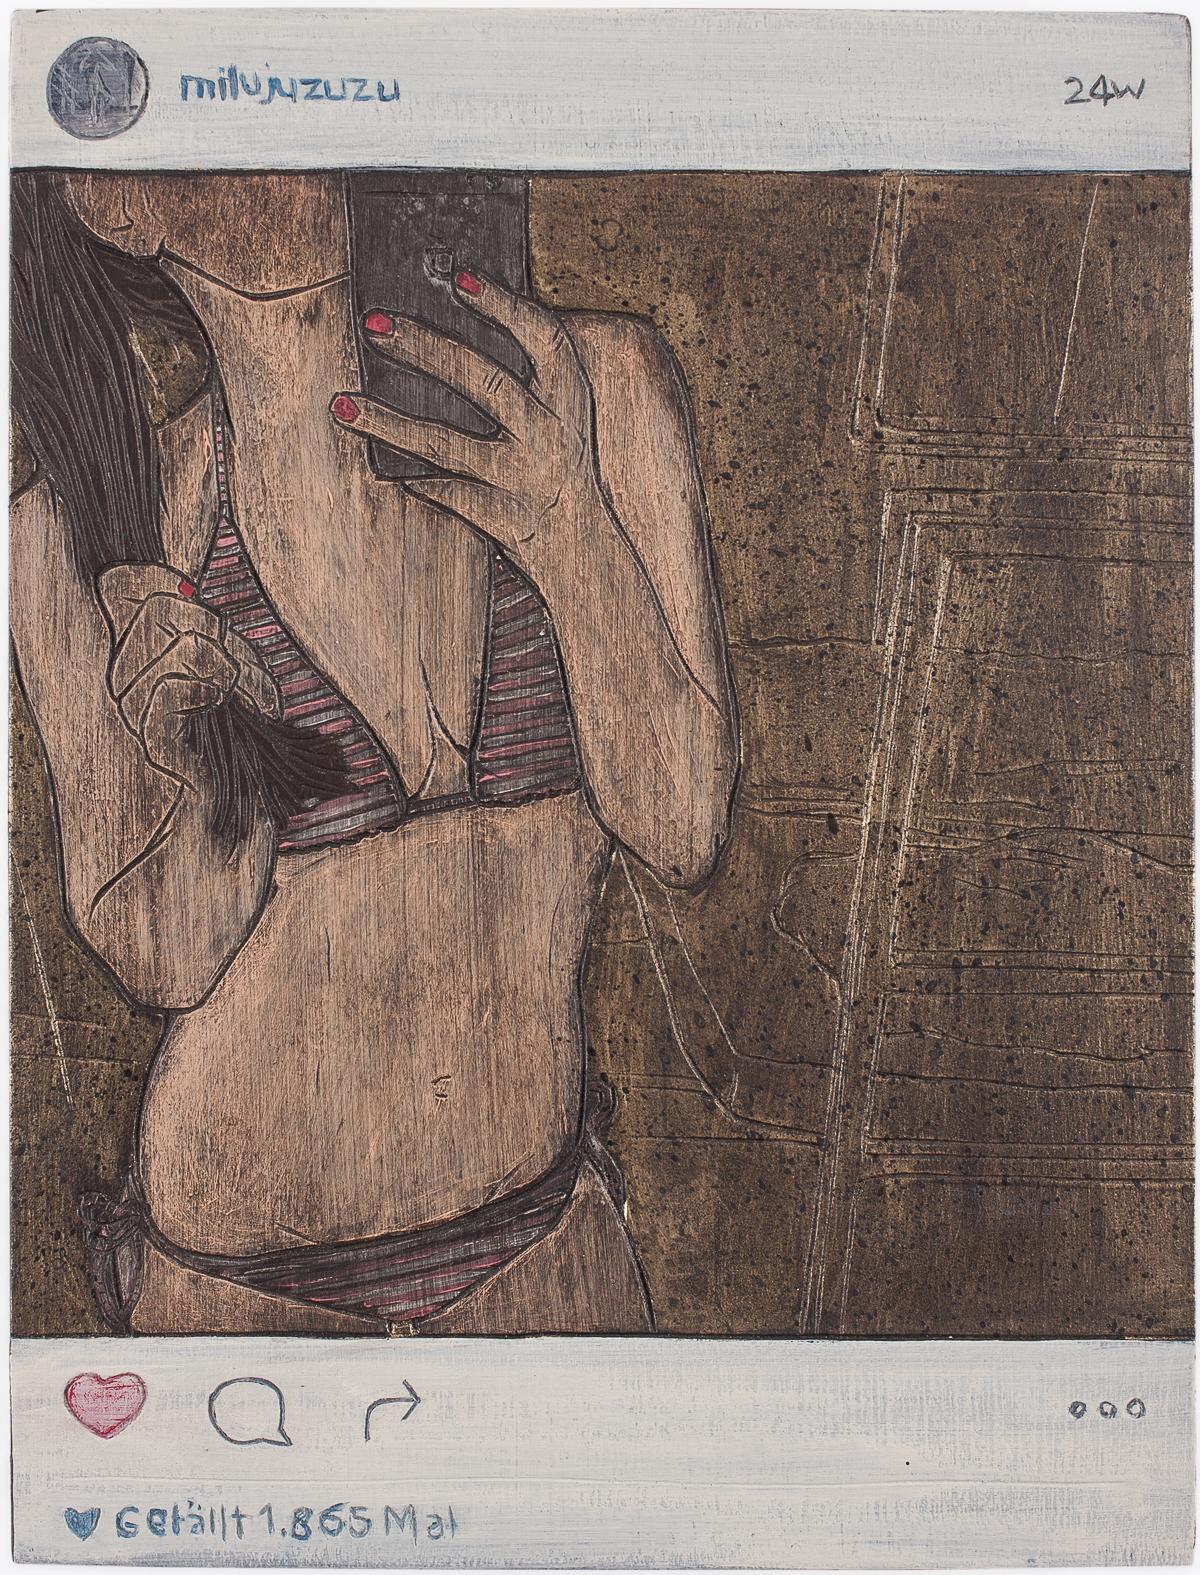 "Alex Diamond: Gefällt 1.865 Mal (2016)  acrylic paint, woodcut, 18 x 24 x 3 cm (7"" x 9.5"" x 1.2"") | Instagram user @milujuzuzu"